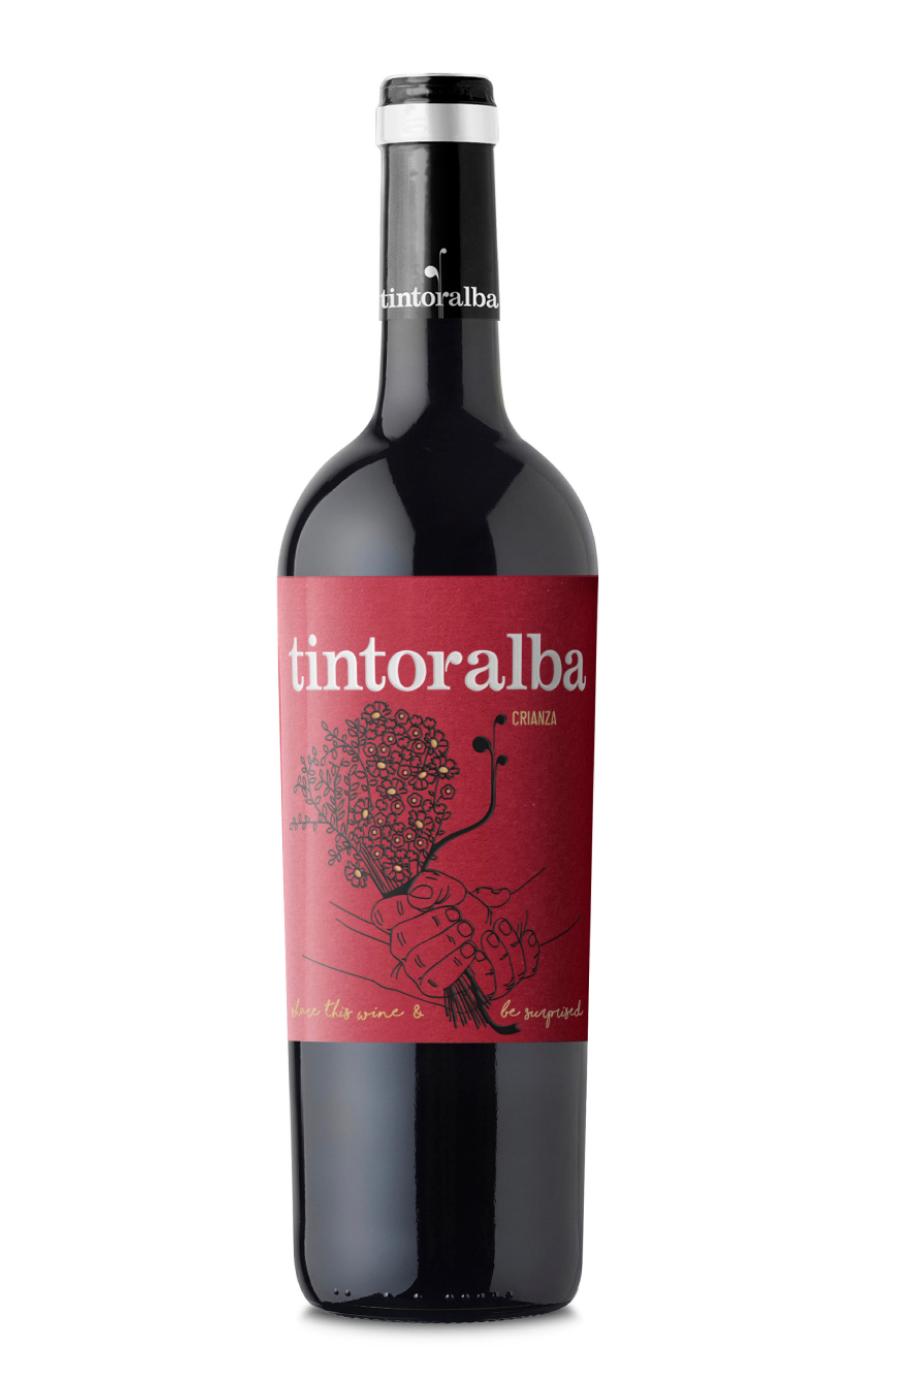 Tintoralba Crianza | Tintoralba - Winexfood